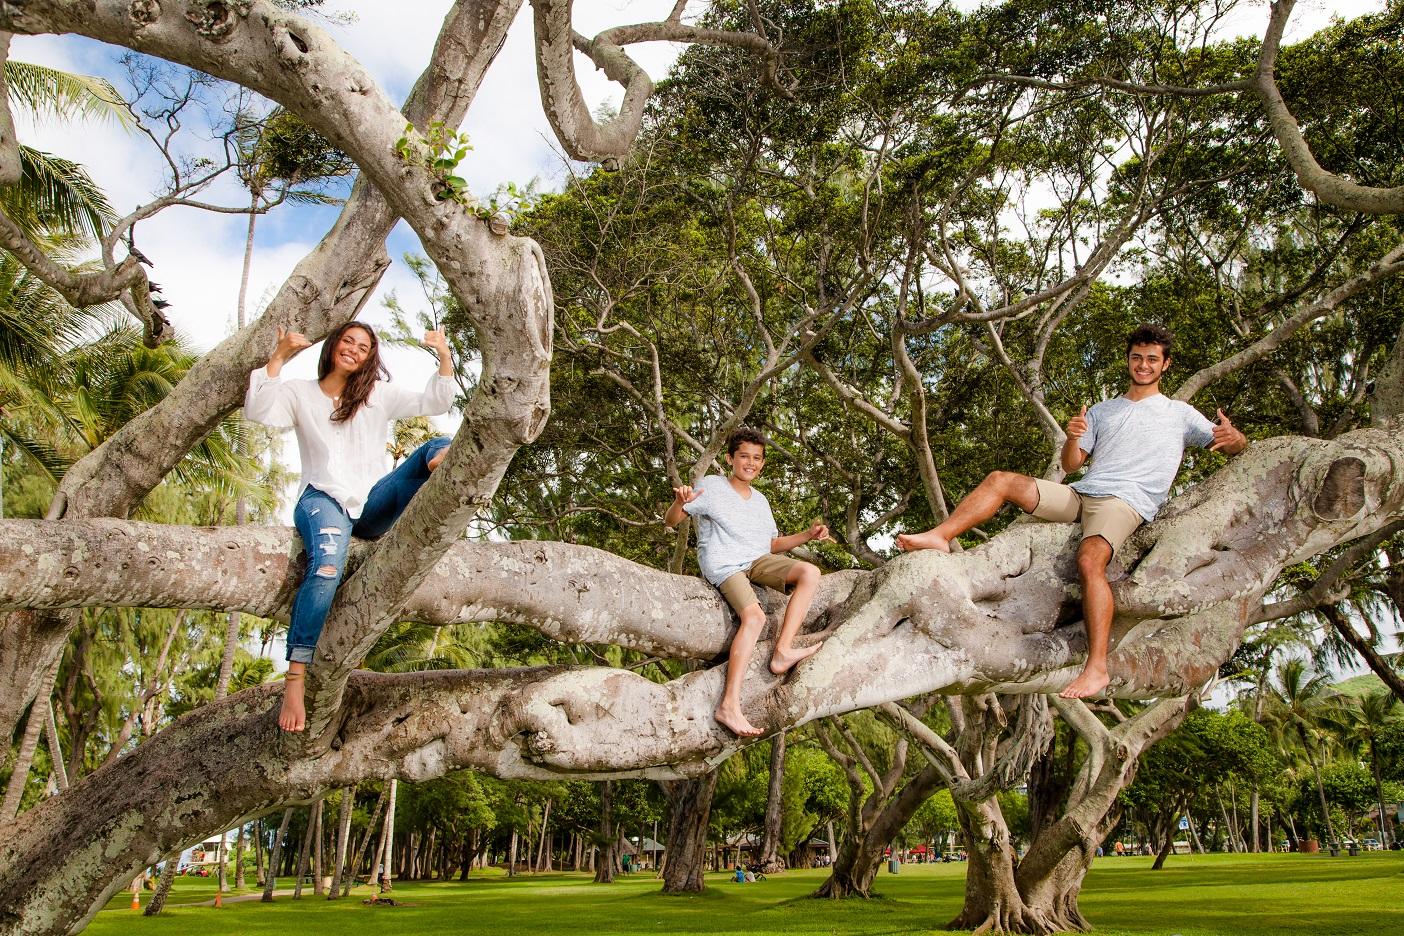 kailua oahu family photos photographer hawaii